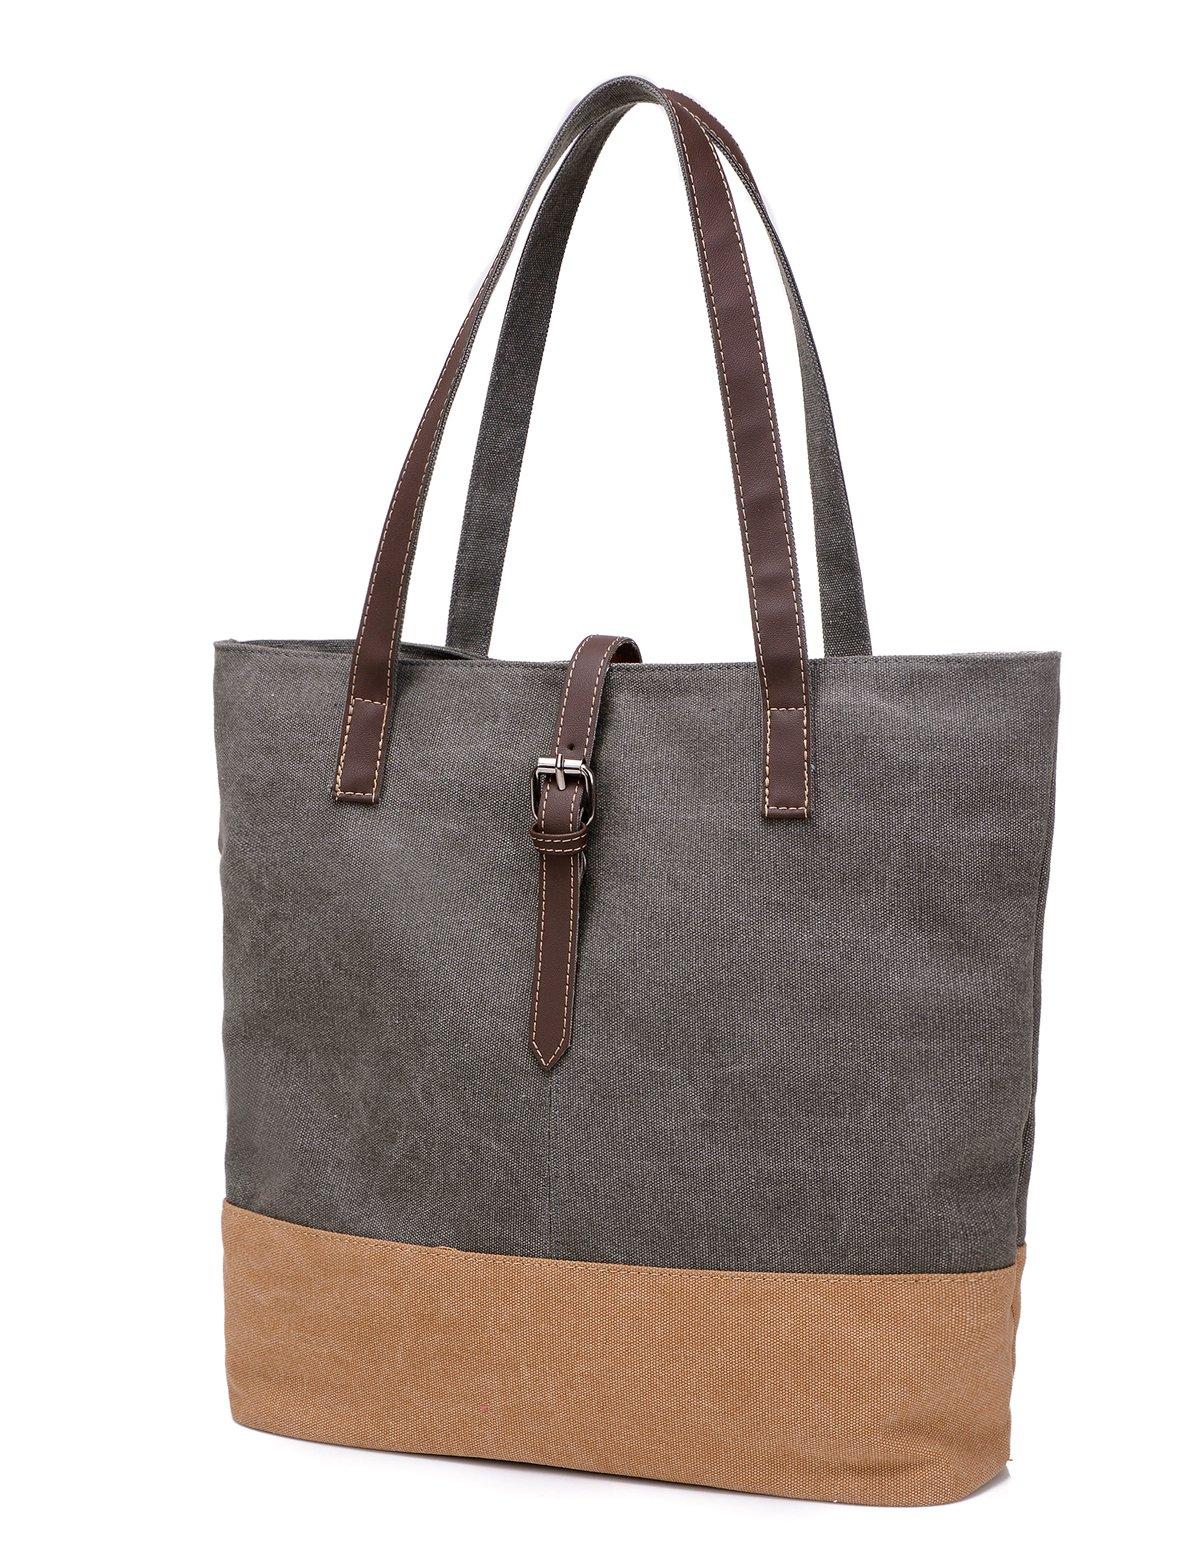 DOURR Women's Canvas Shoulder Bag Handbag Tote purse (gray)